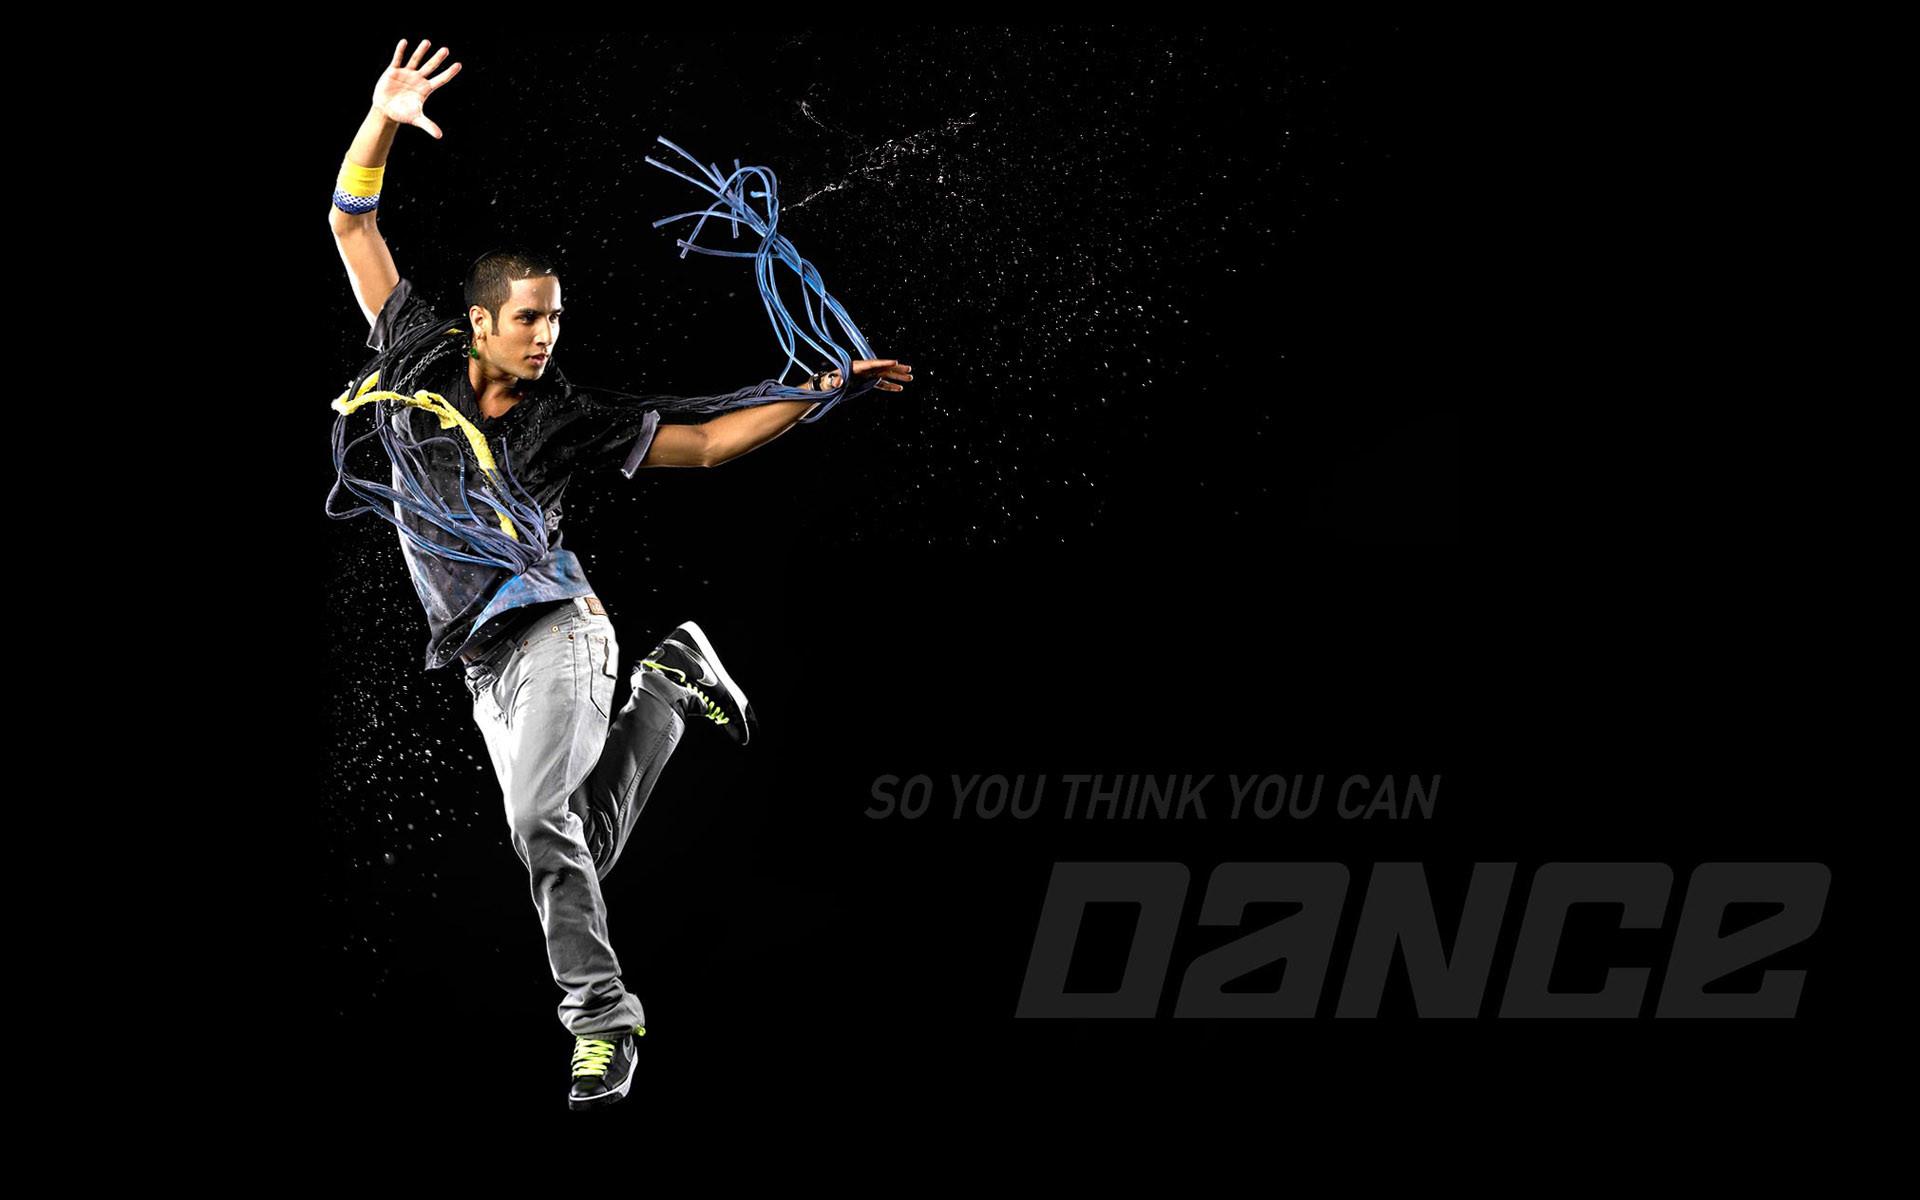 So You Think You Can Dance Man Tv Dance Dancer Dancing Male Wallpaper .